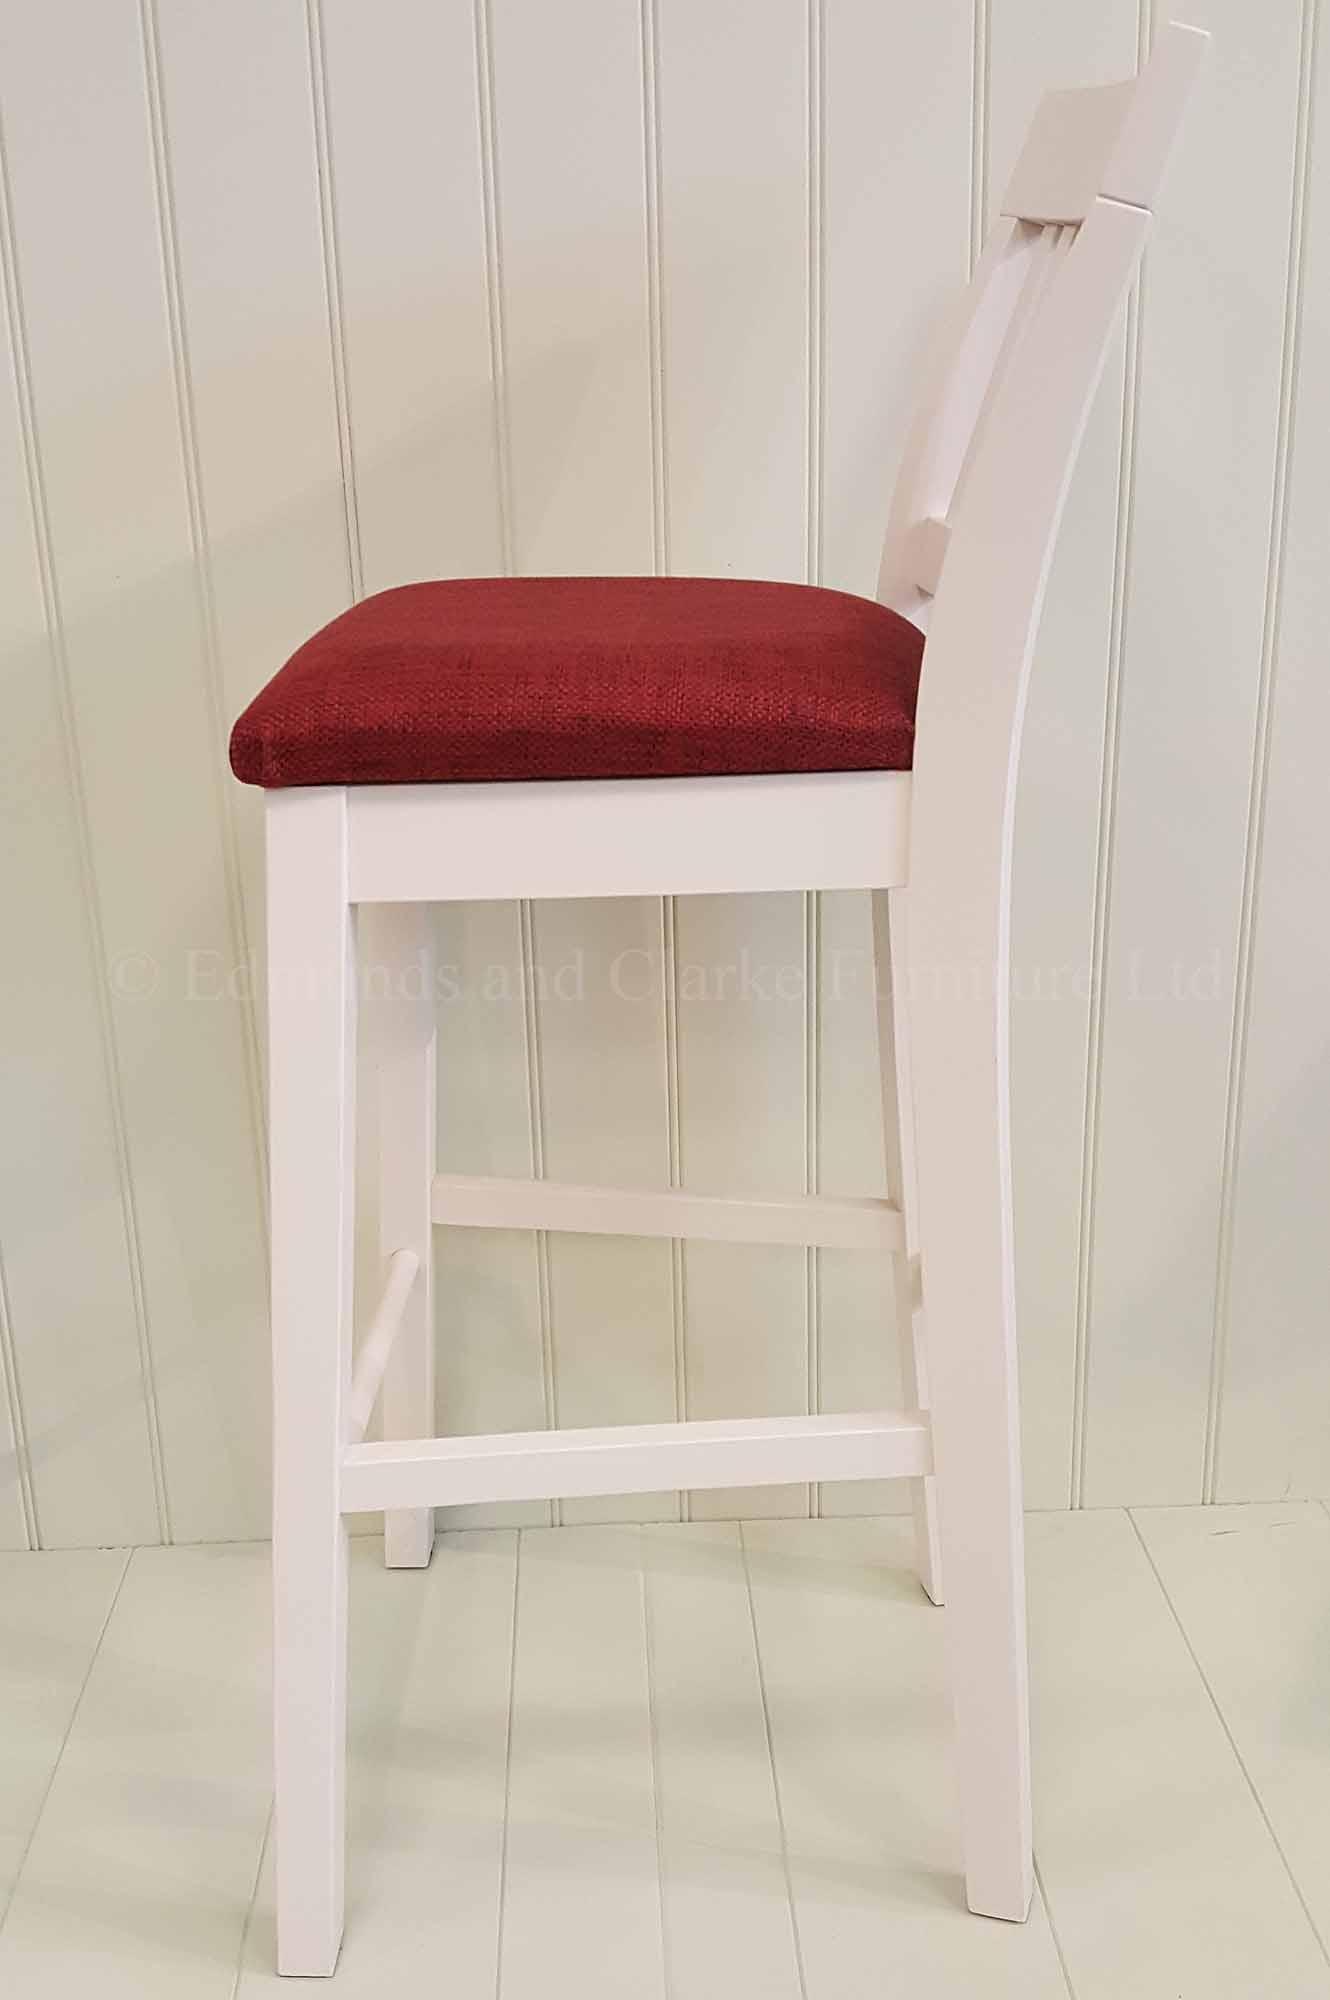 Linden painted kitchen bar stool